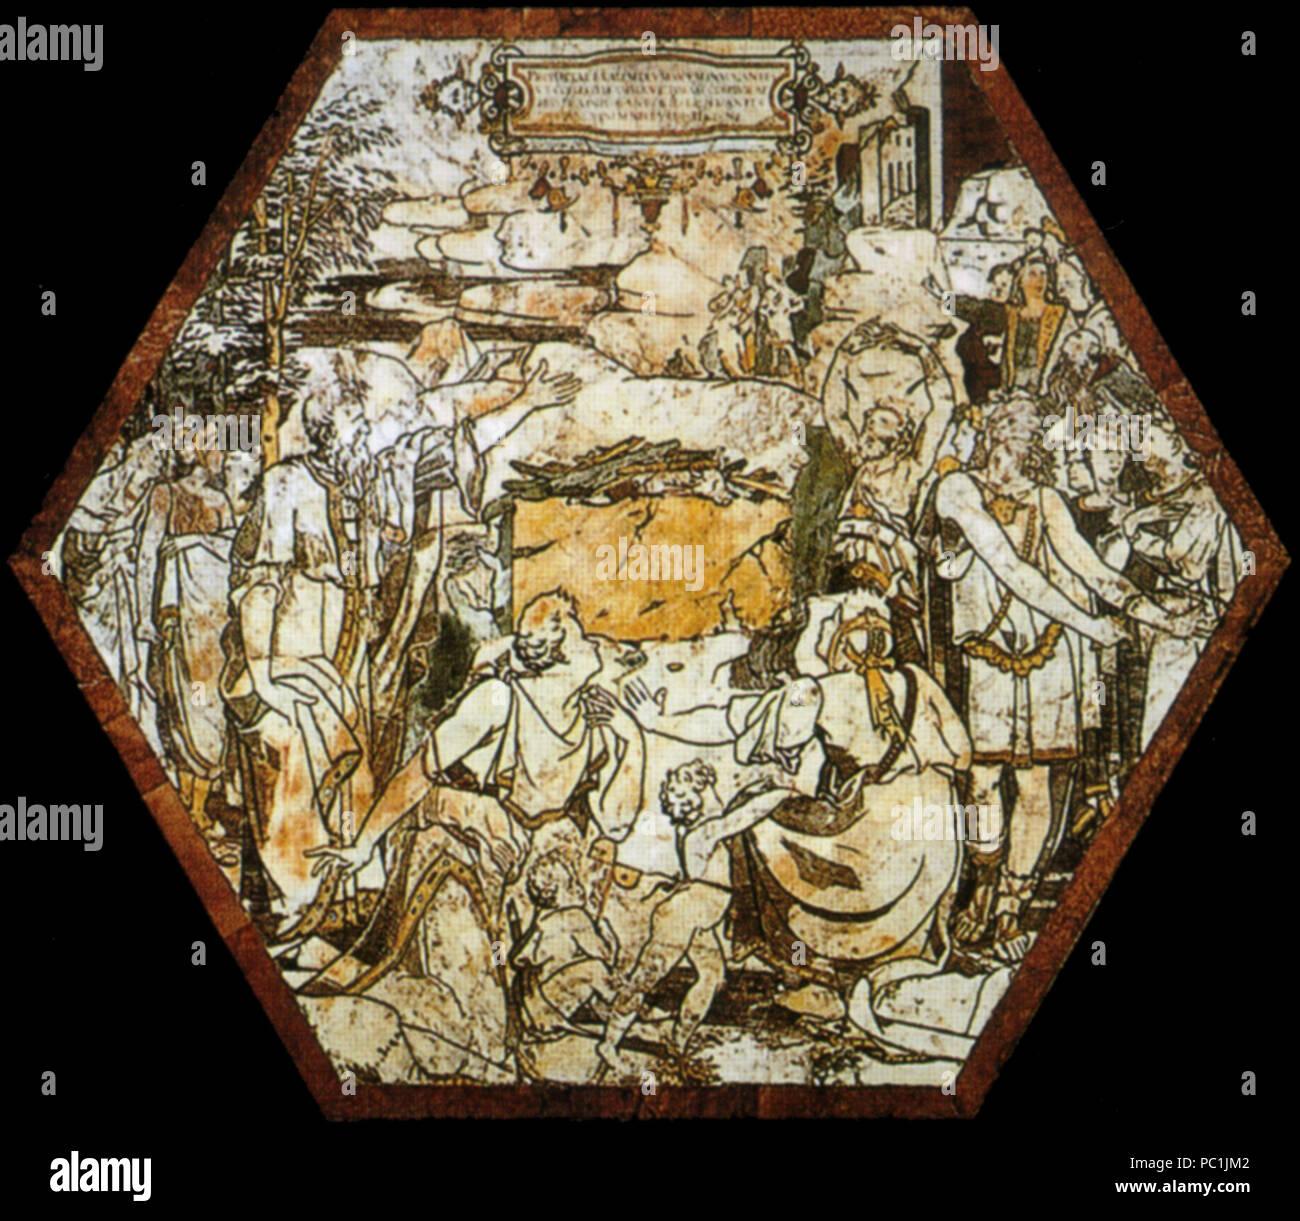 472 Pavimento di siena, esagono, sacrificio dei sacerdoti di baal (beccafumi) Stock Photo